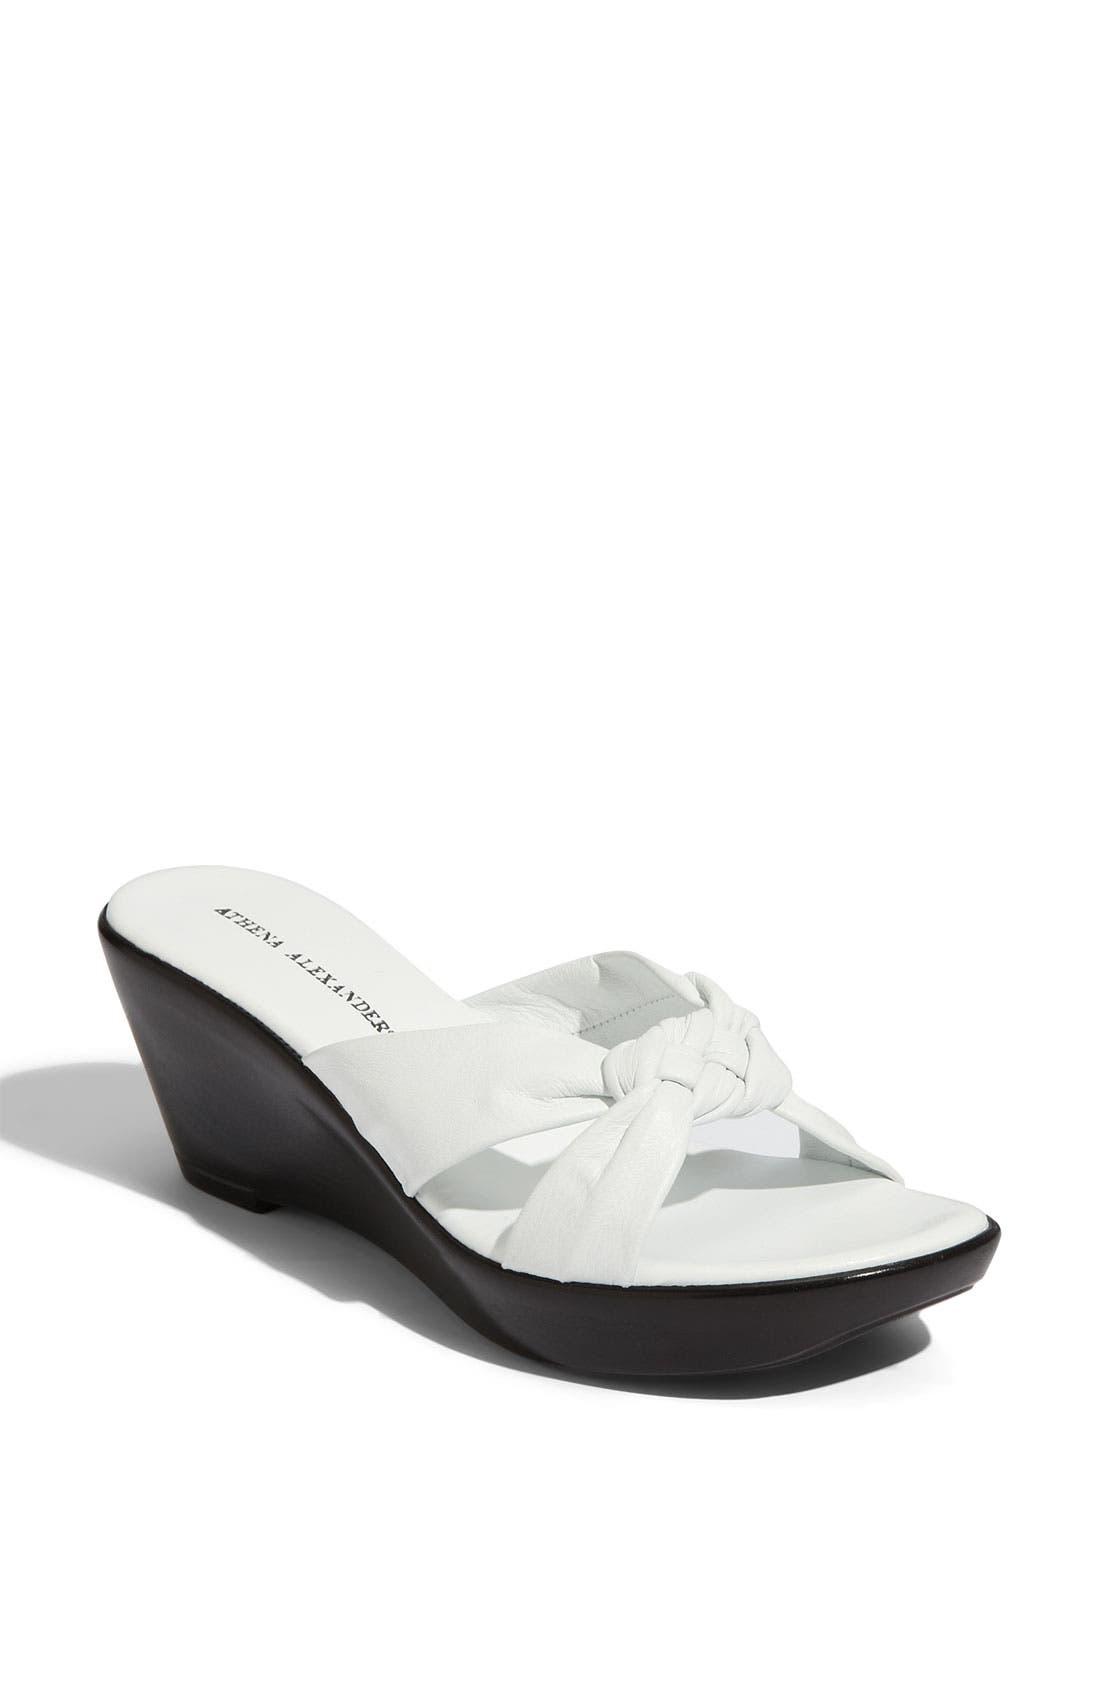 Alternate Image 1 Selected - Athena Alexander 'Diane' Wedge Sandal